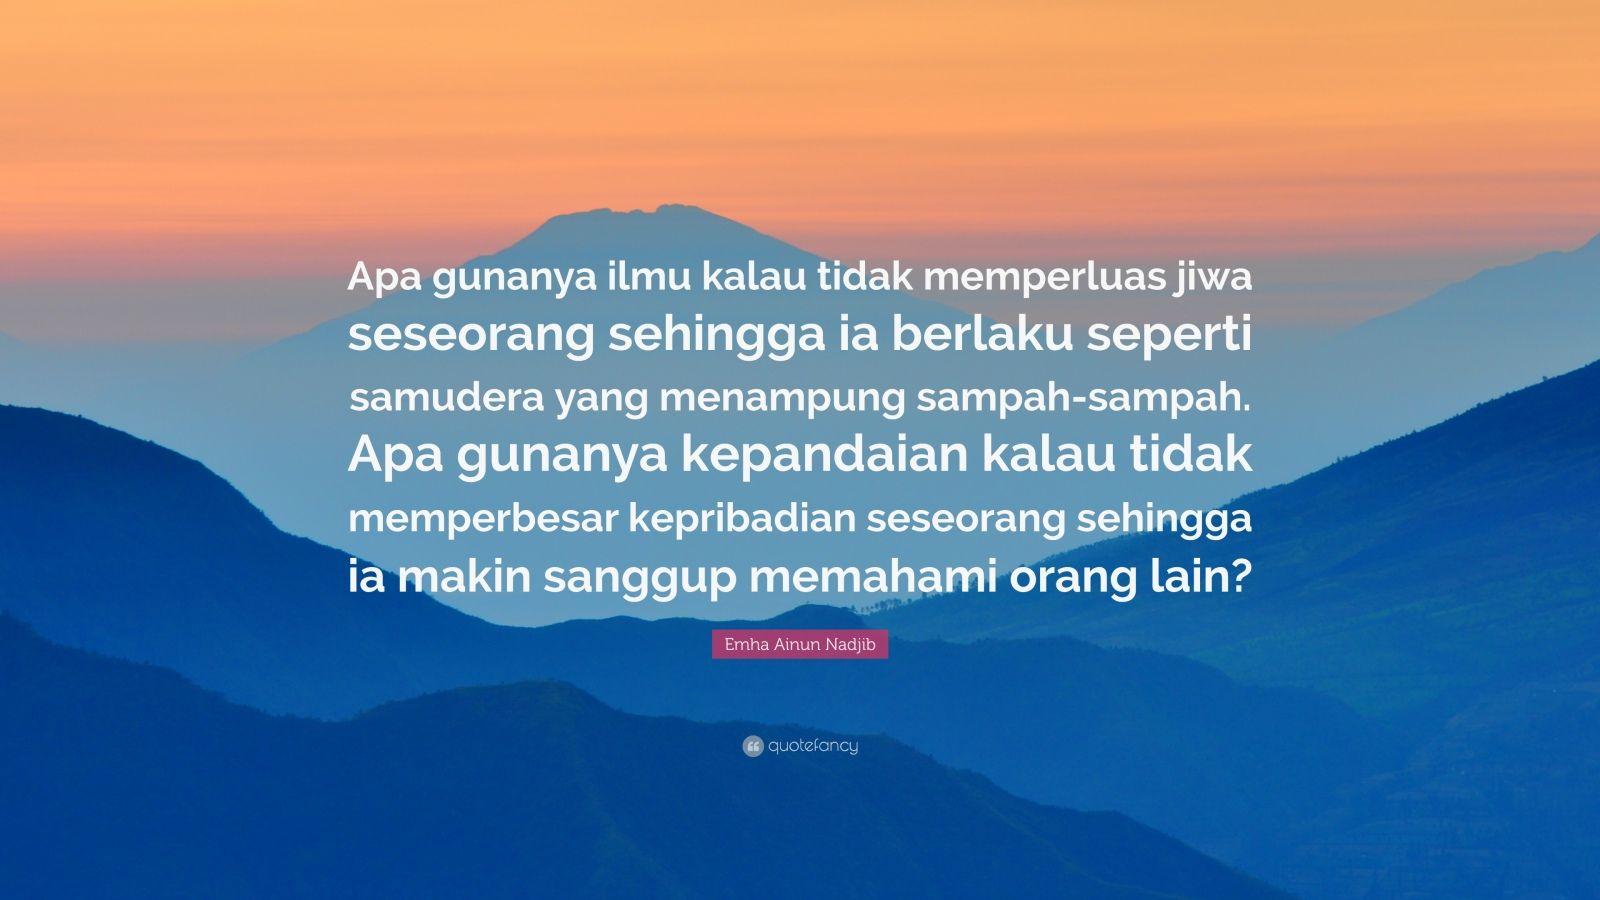 Wise Ainun Najib Wise Quotes